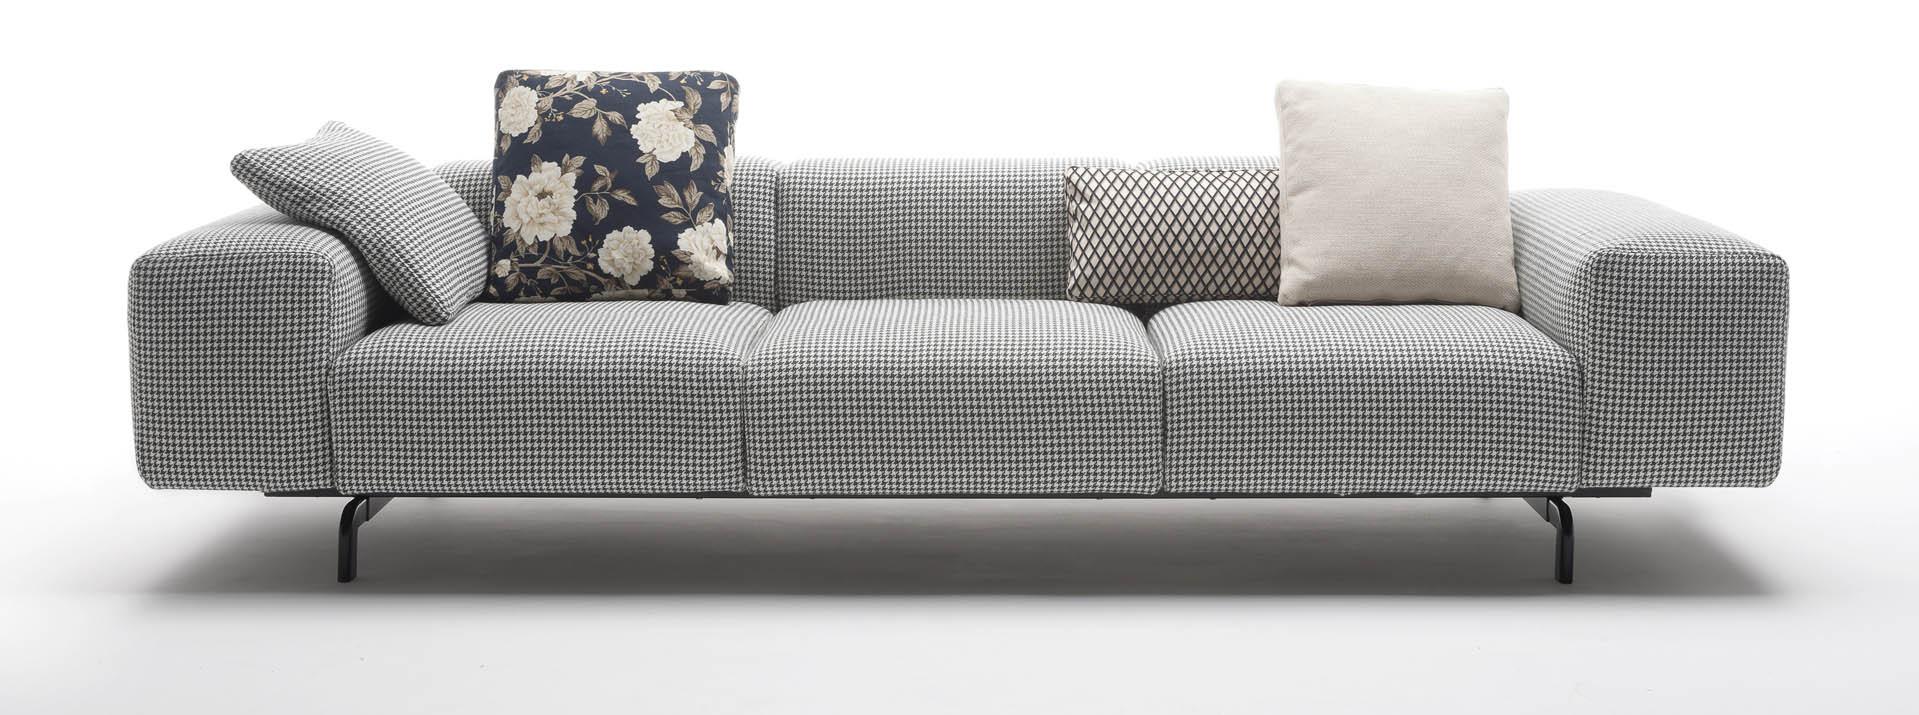 kartell sofa largo leather camelback 7150-7160 - sofás